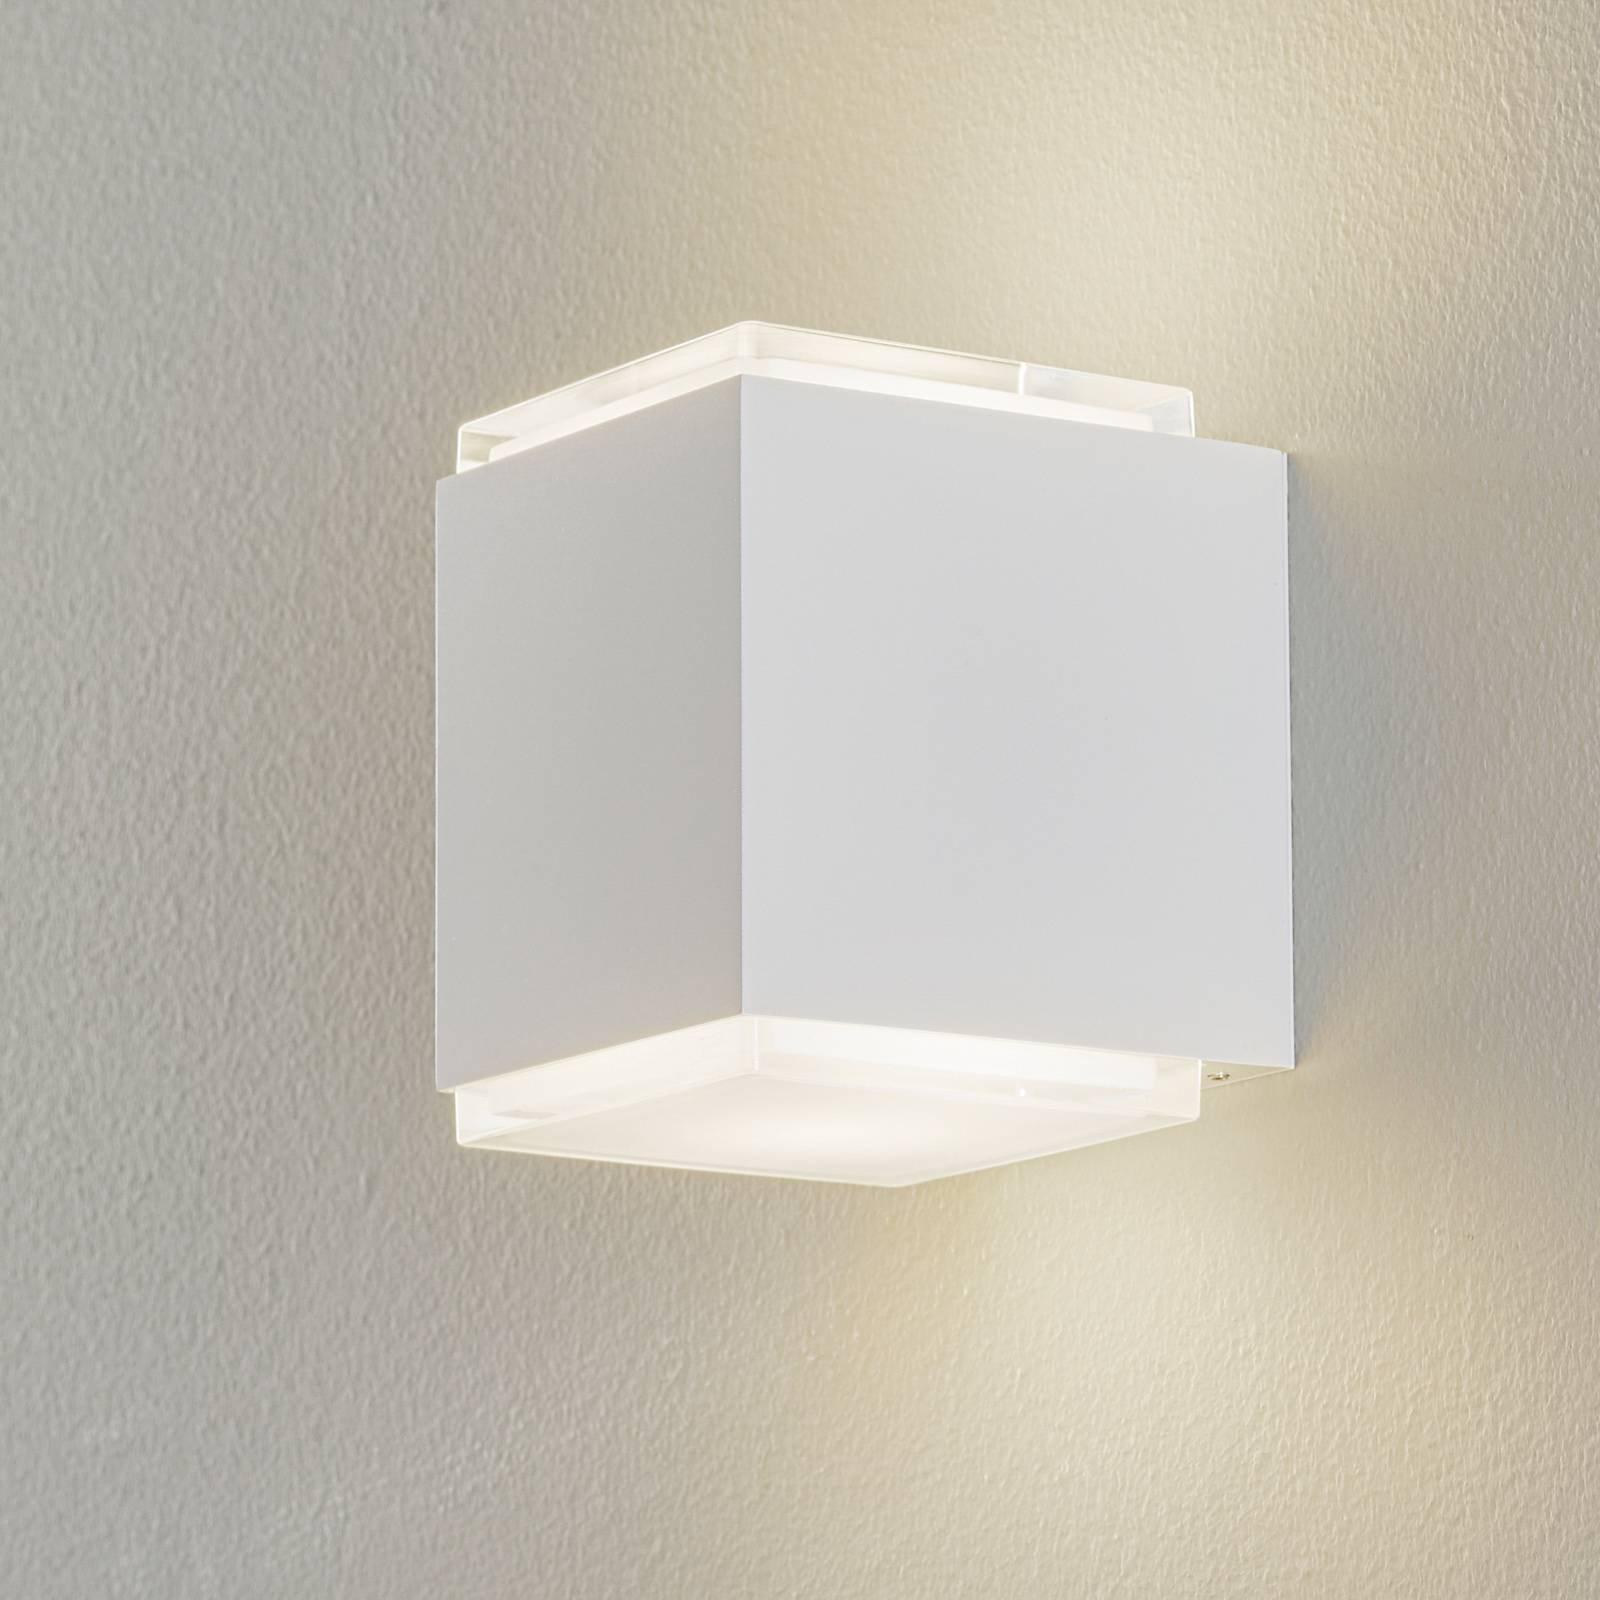 BEGA 50064 LED-vegglampe 3 000 K 12 cm DALI hvitt